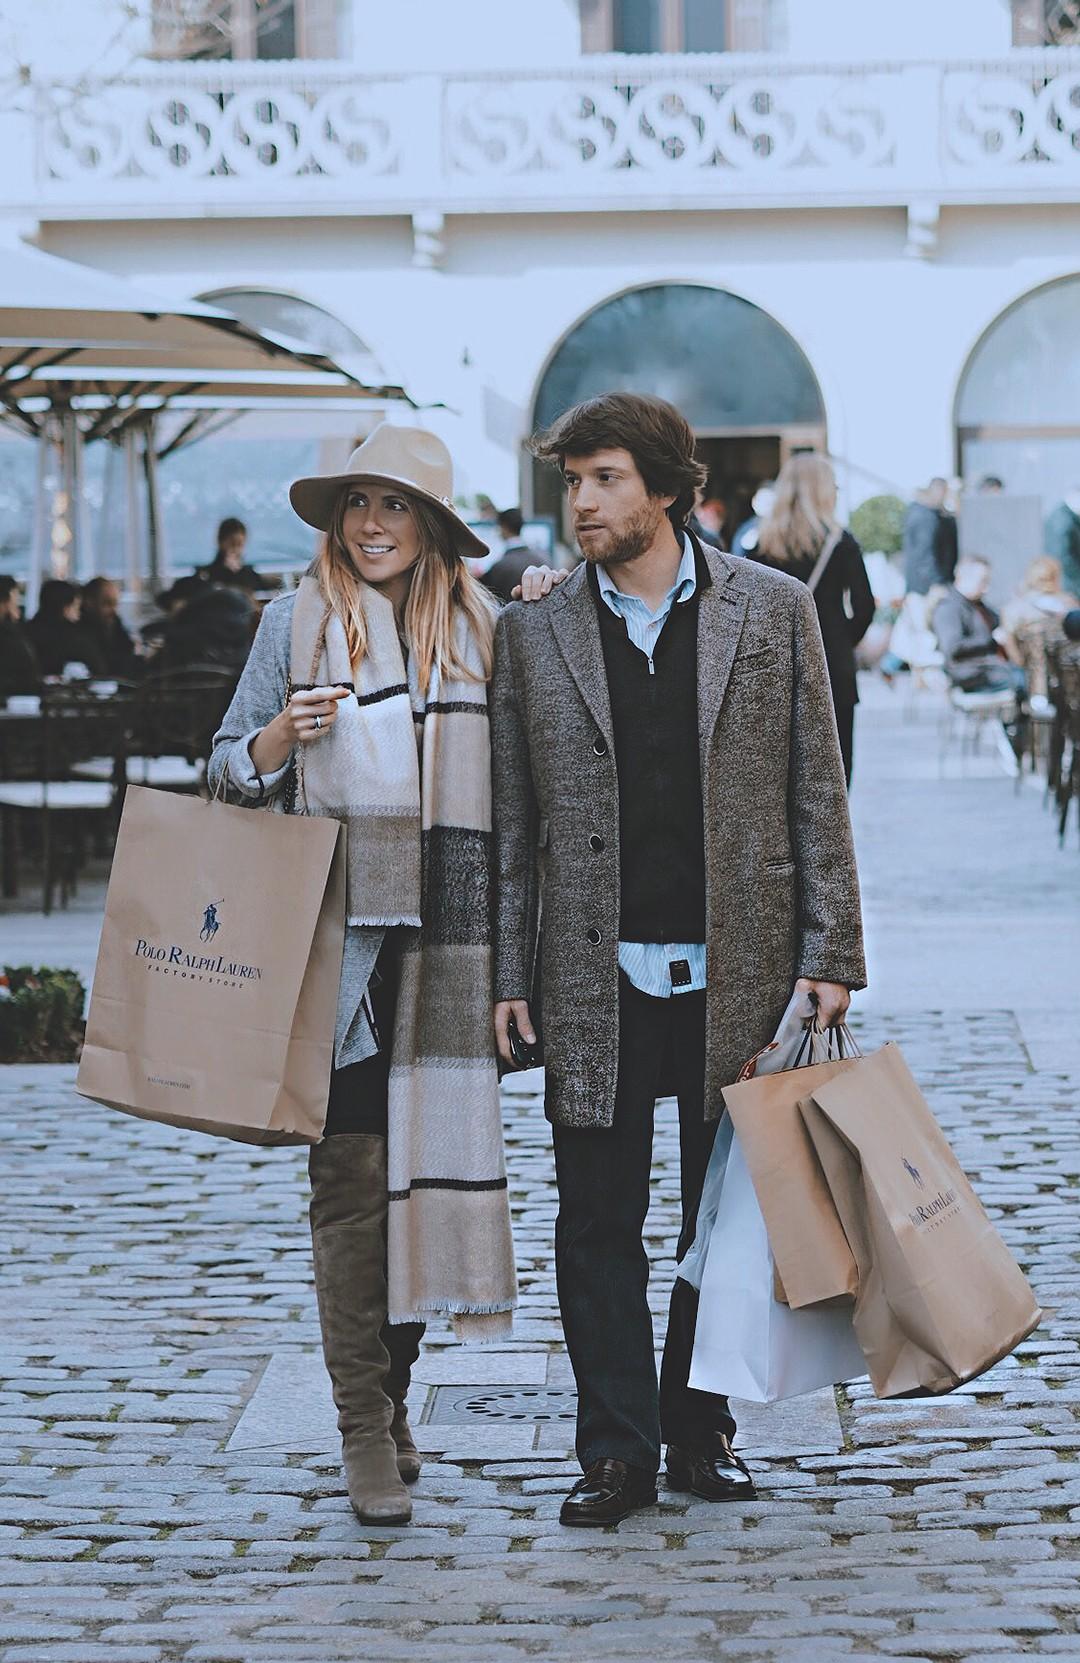 la-roca-village-shopping-day-couple-fashion-blog-barcelona-2017img_5182